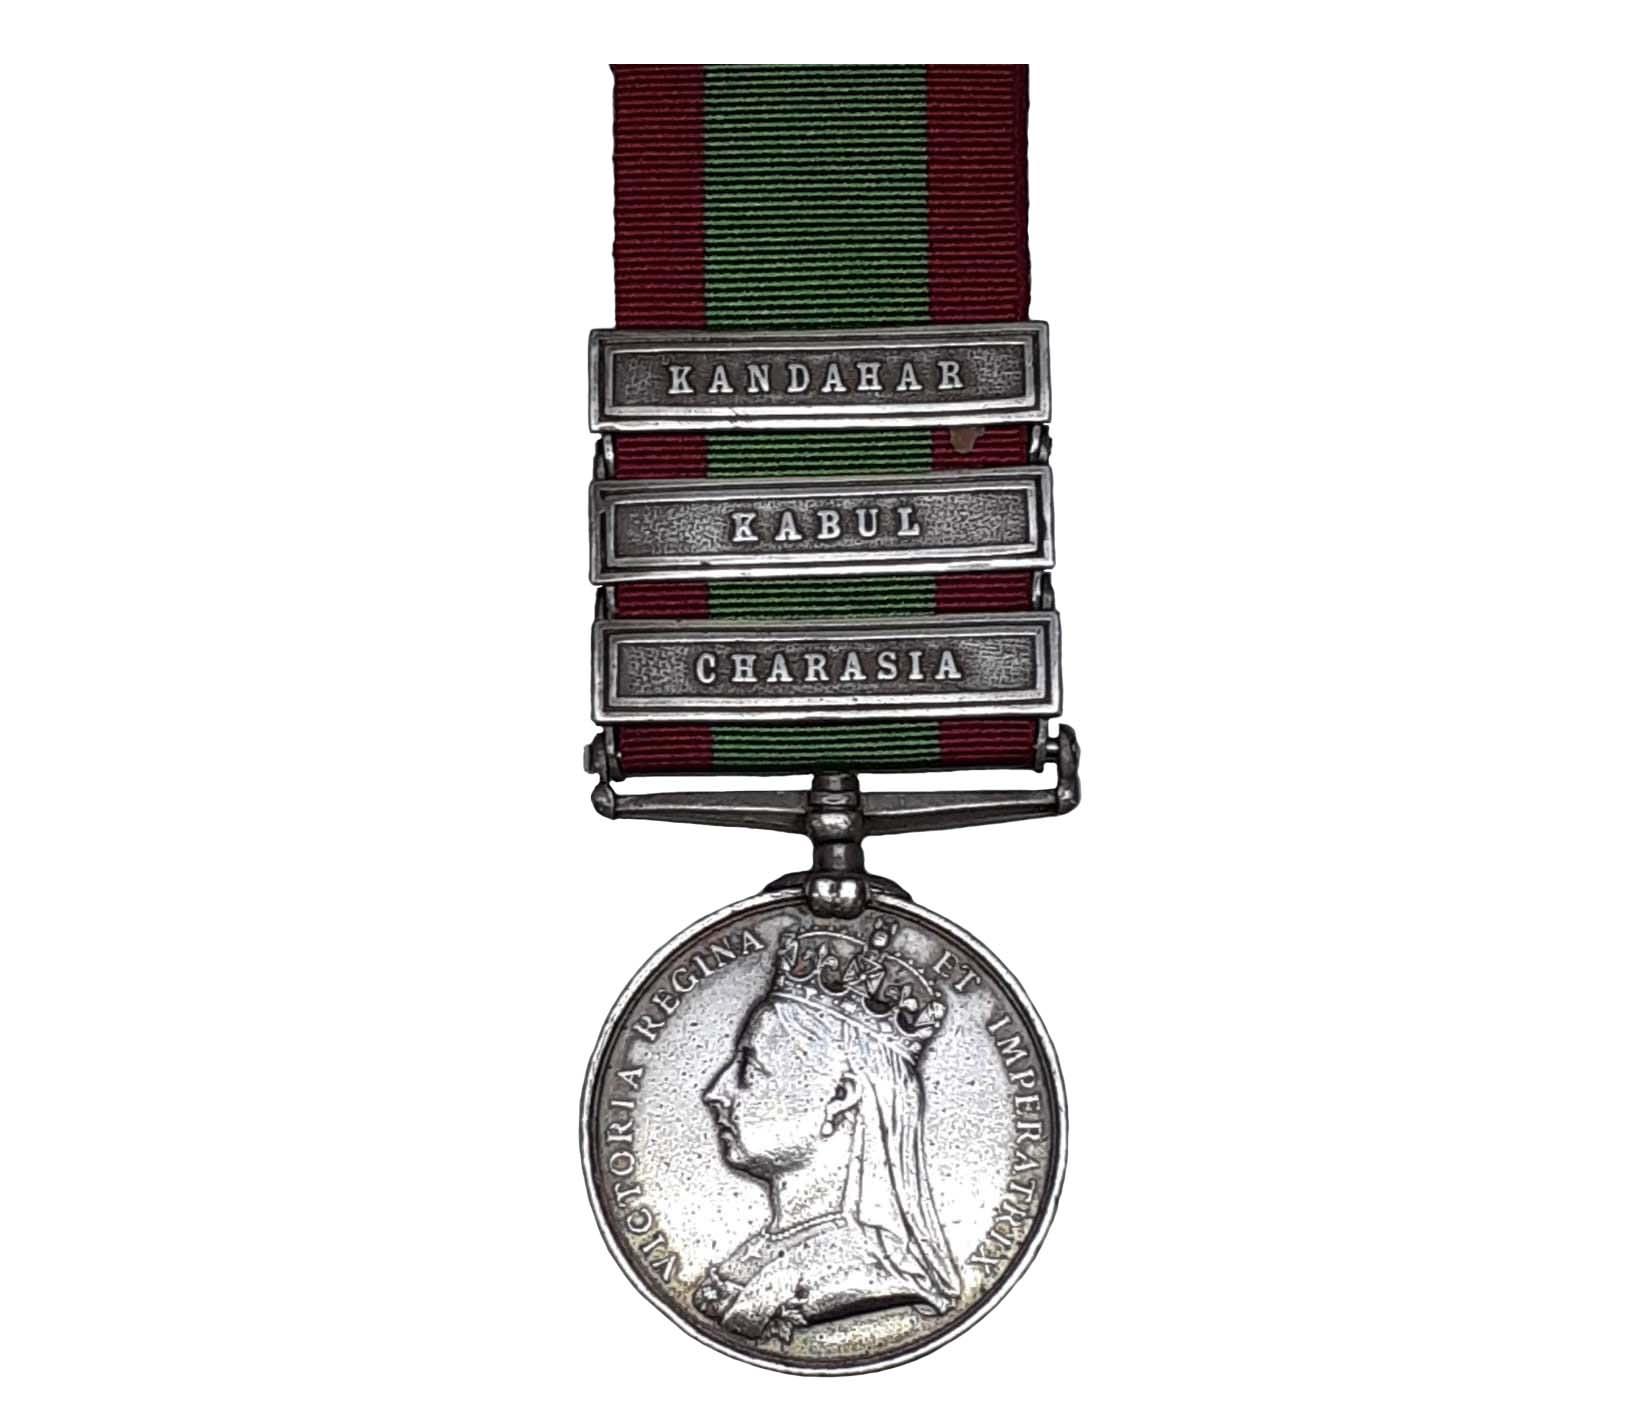 Afghanistan Medal, 1878-80, three clasps Charasia, Kabul, Kandahar to Private John Smith